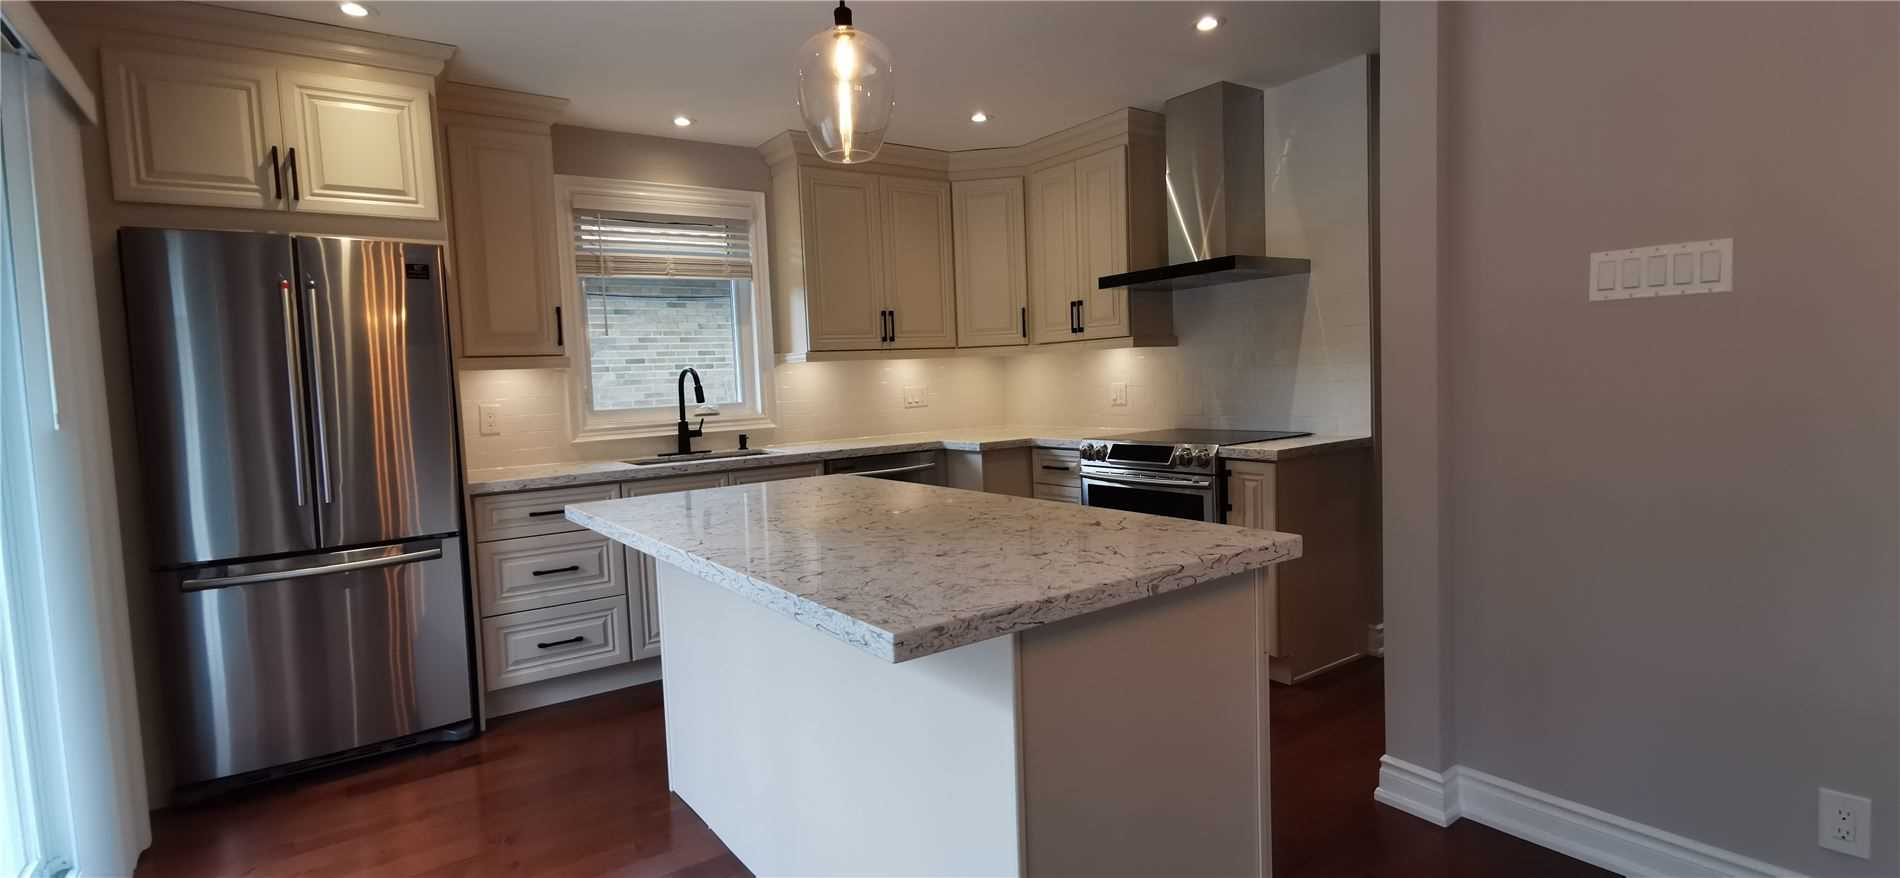 141 Birkdale Rd, Toronto E4565227